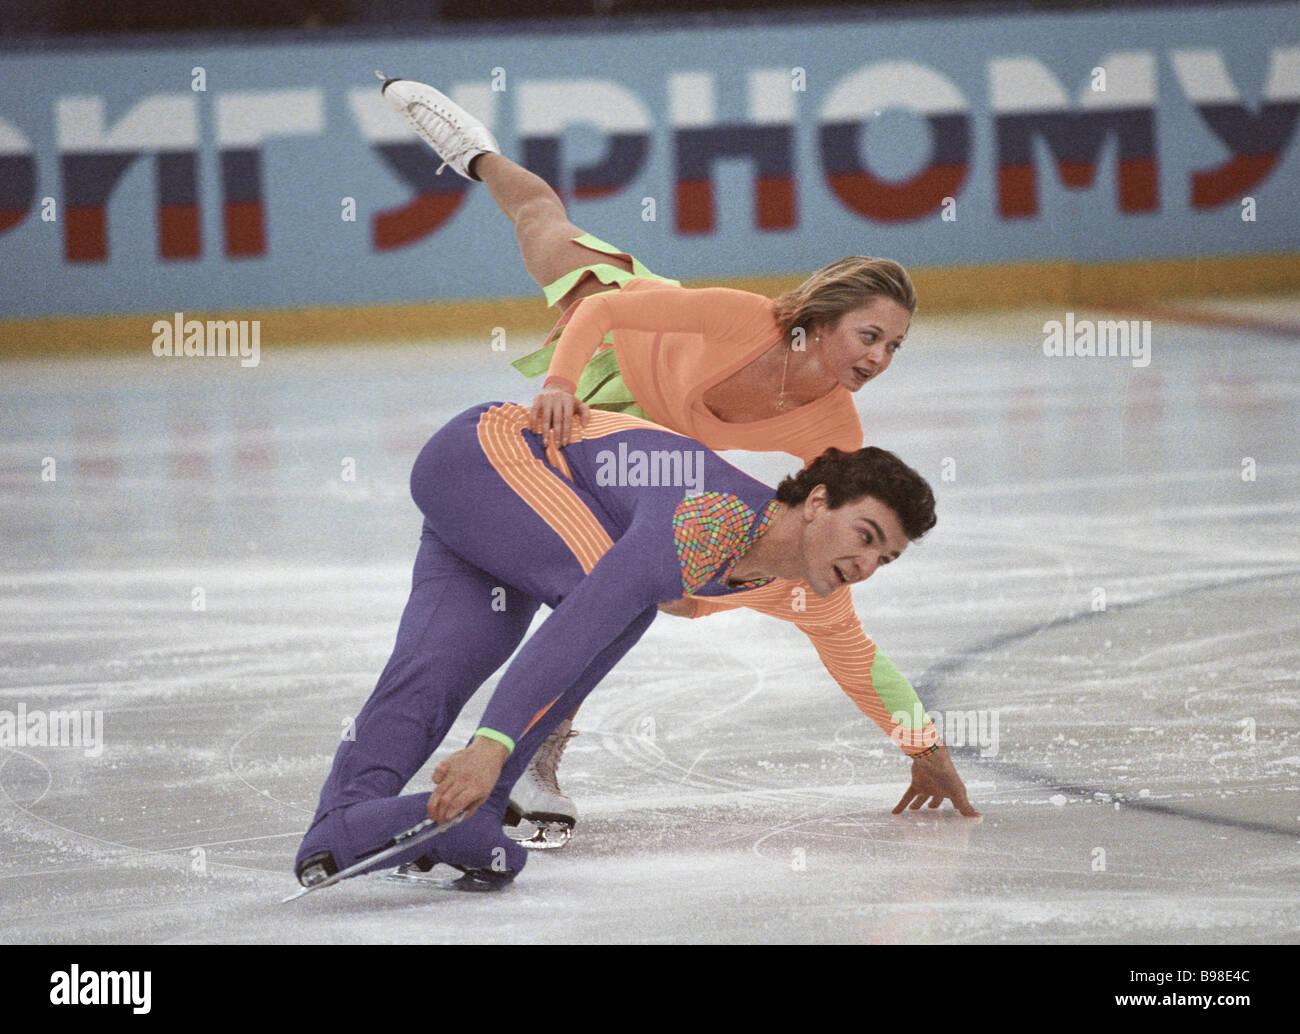 figure-skaters-elena-berezhnaya-in-overhead-bird-and-anton-sikharulidze-B98E4C.jpg (1300×1034)